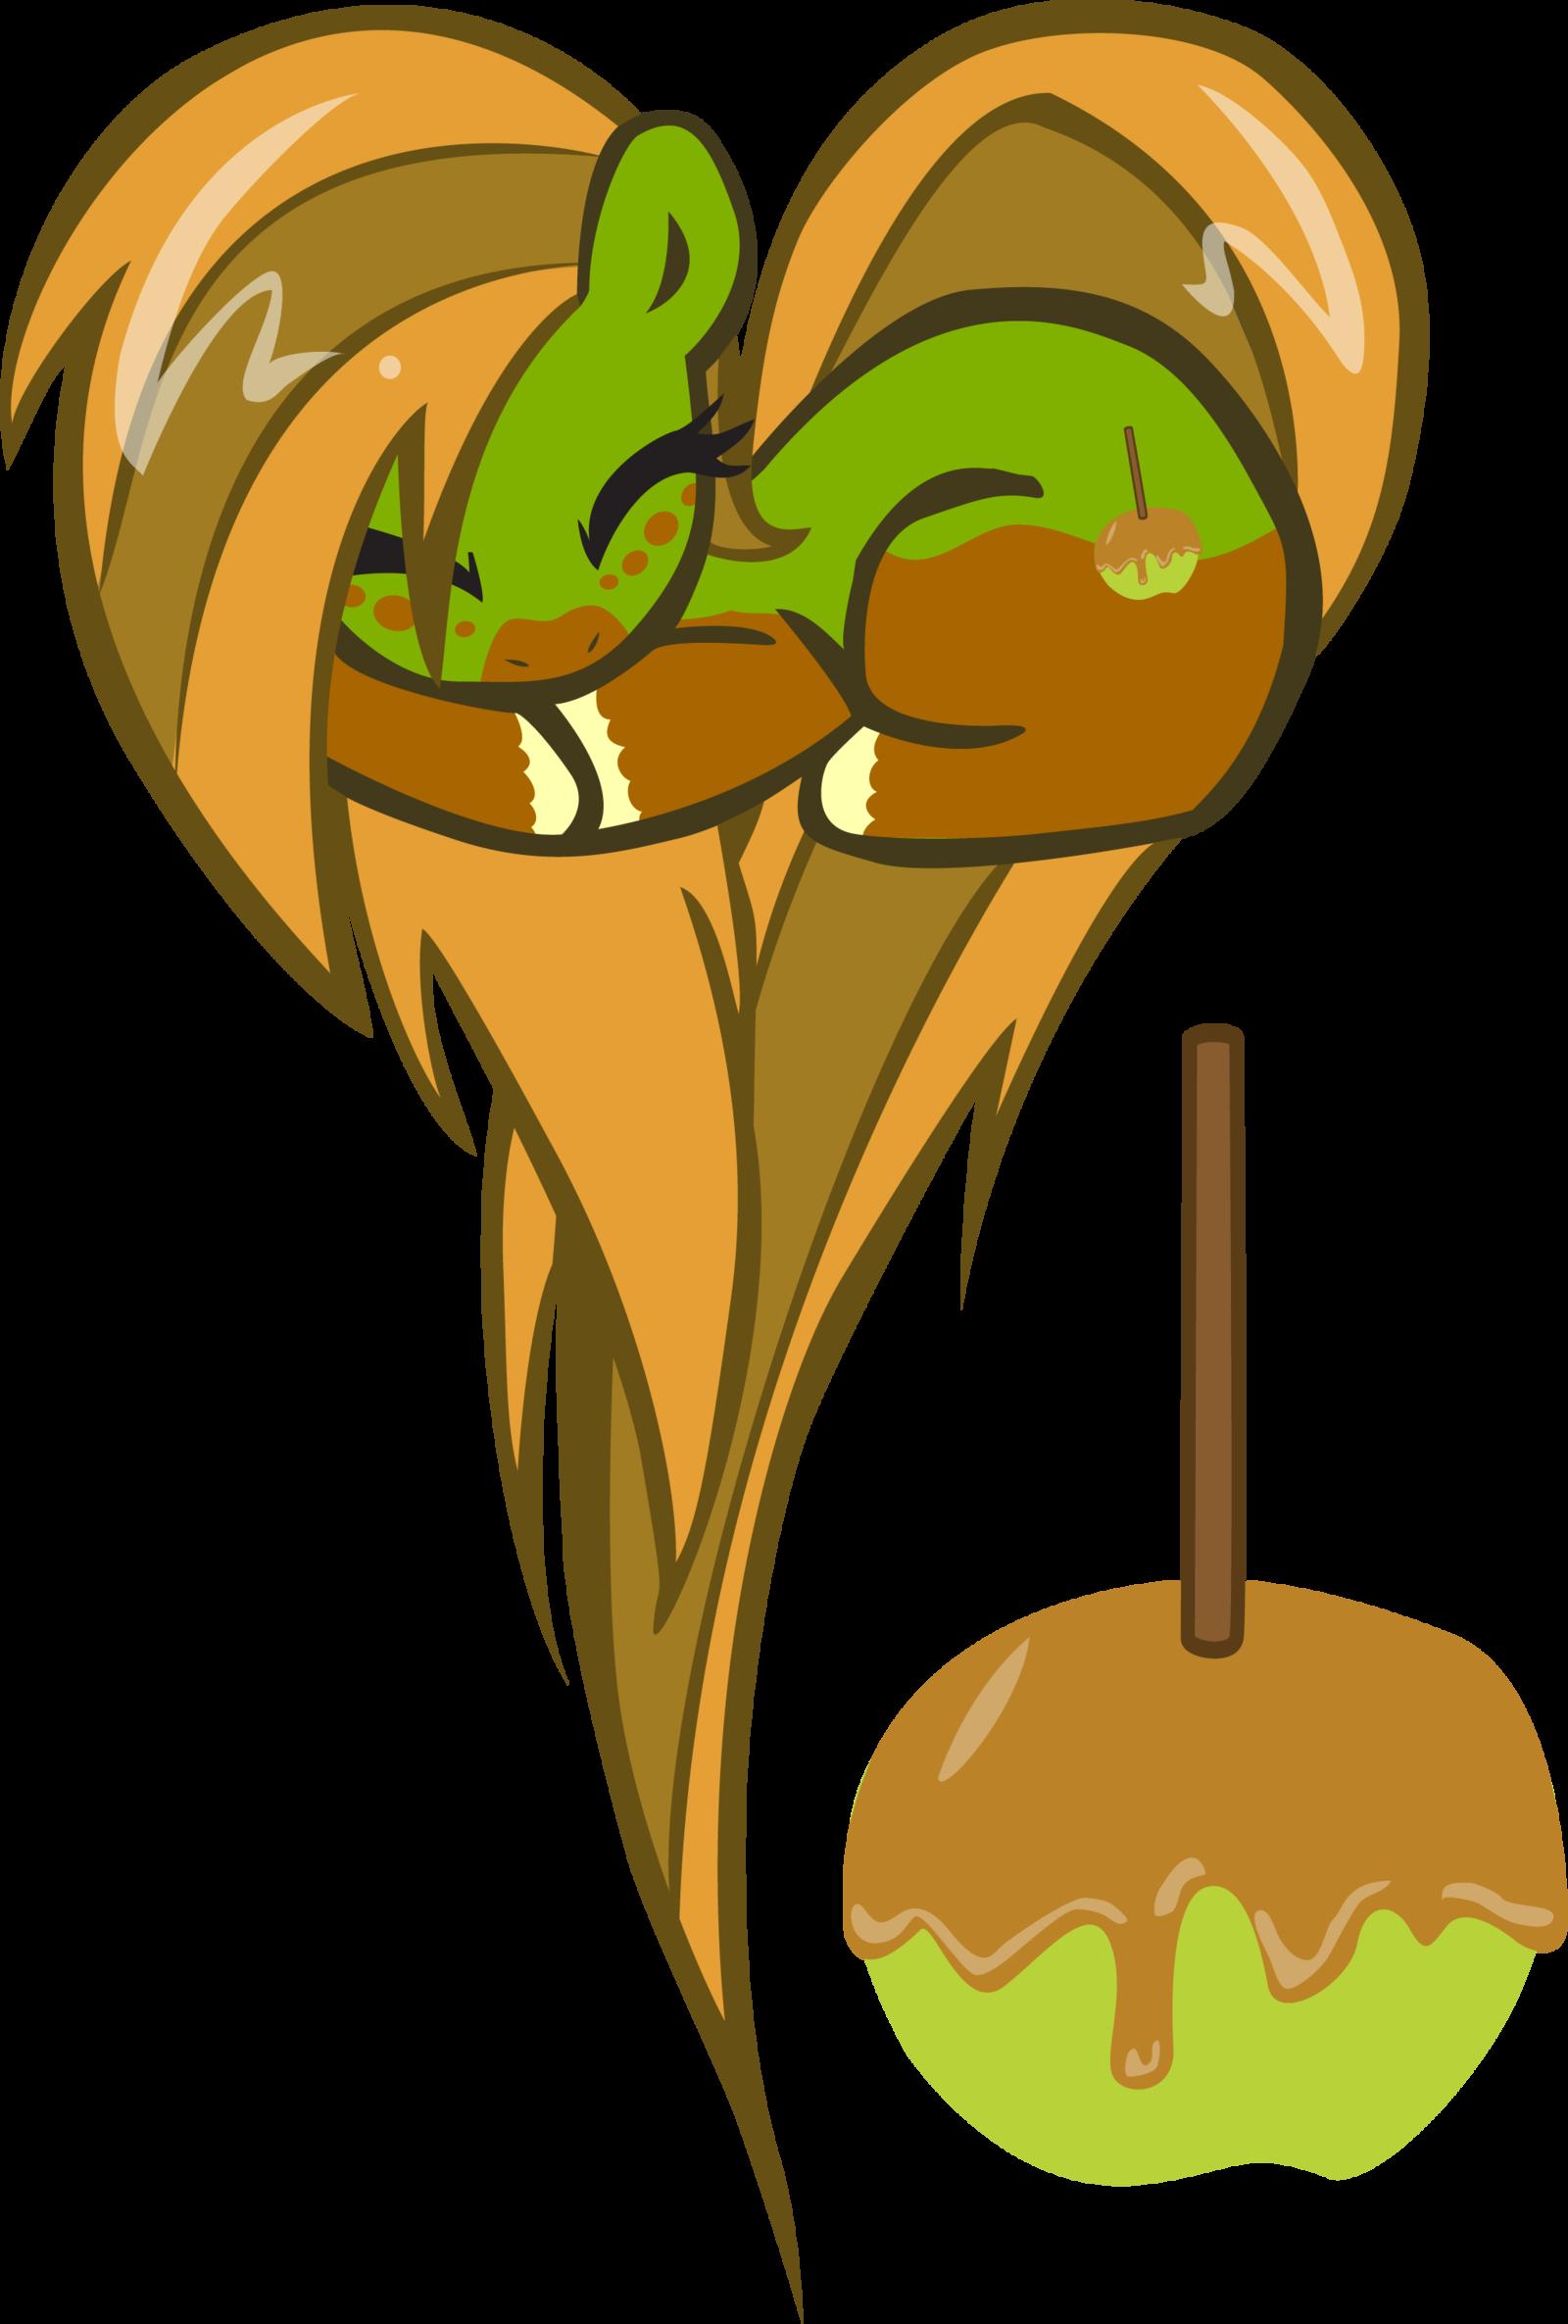 Heart shaped caramel apple clipart png banner royalty free stock mlp apple heart ile ilgili görsel sonucu | My little pony/mlp ... banner royalty free stock